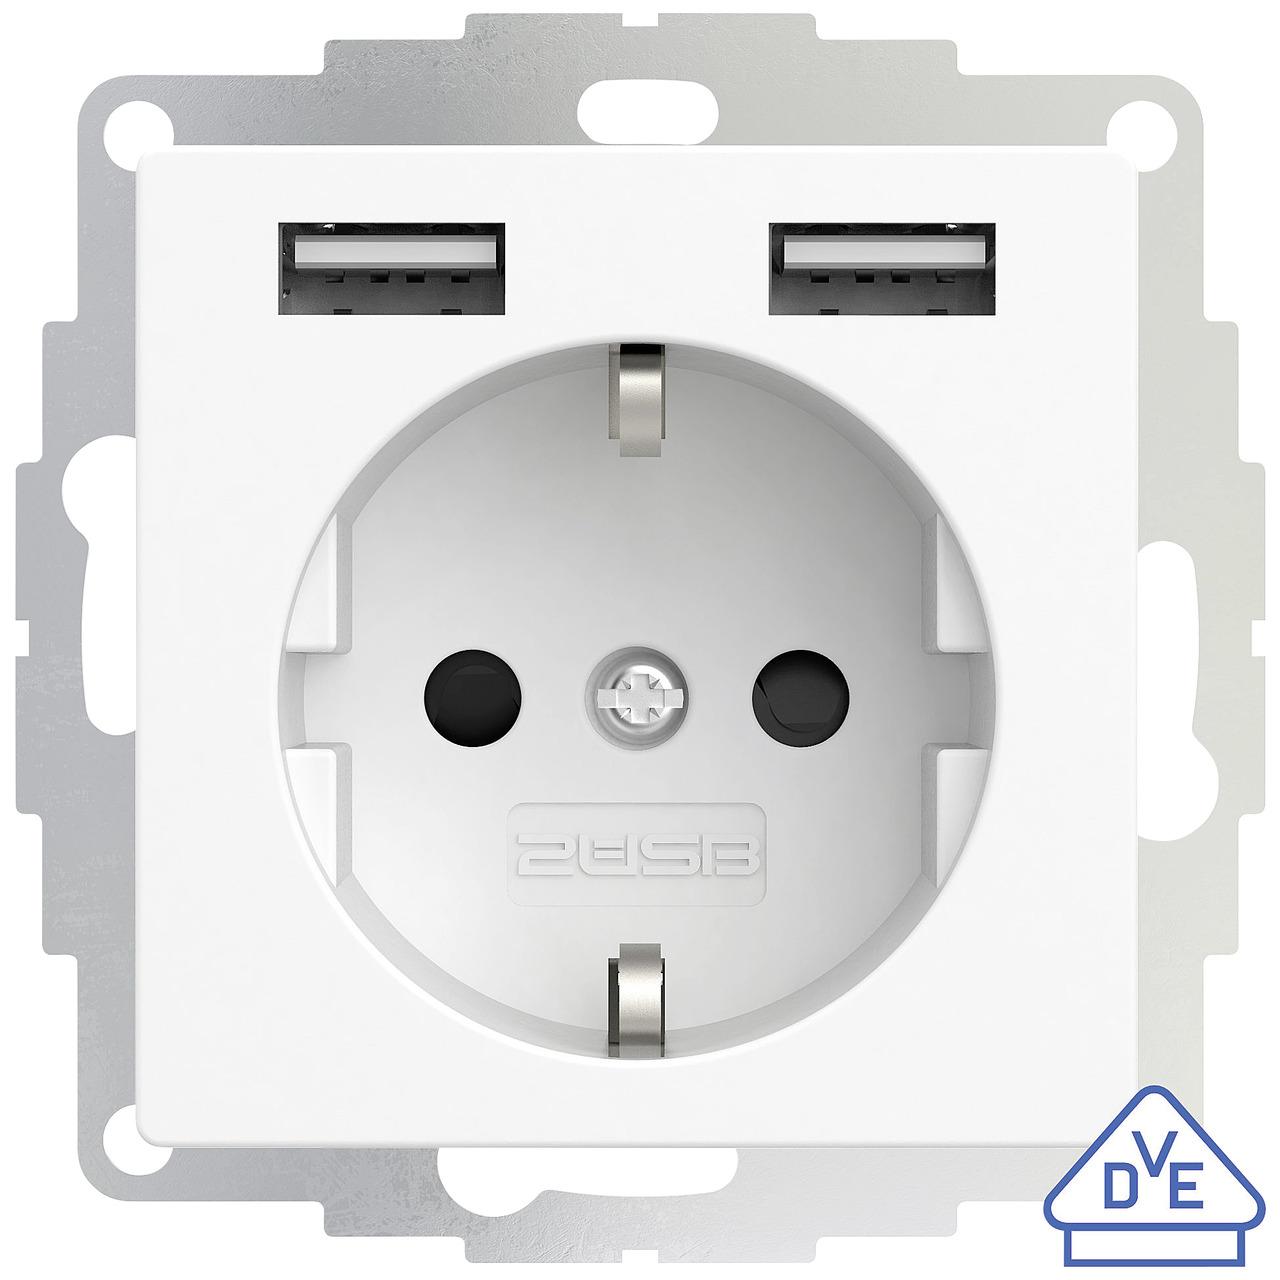 Image of 2USB Schutzkontakt-Steckdose mit 2 USB-Ports, reinweiß matt, 55 x 55 mm, VDE zertifiziert